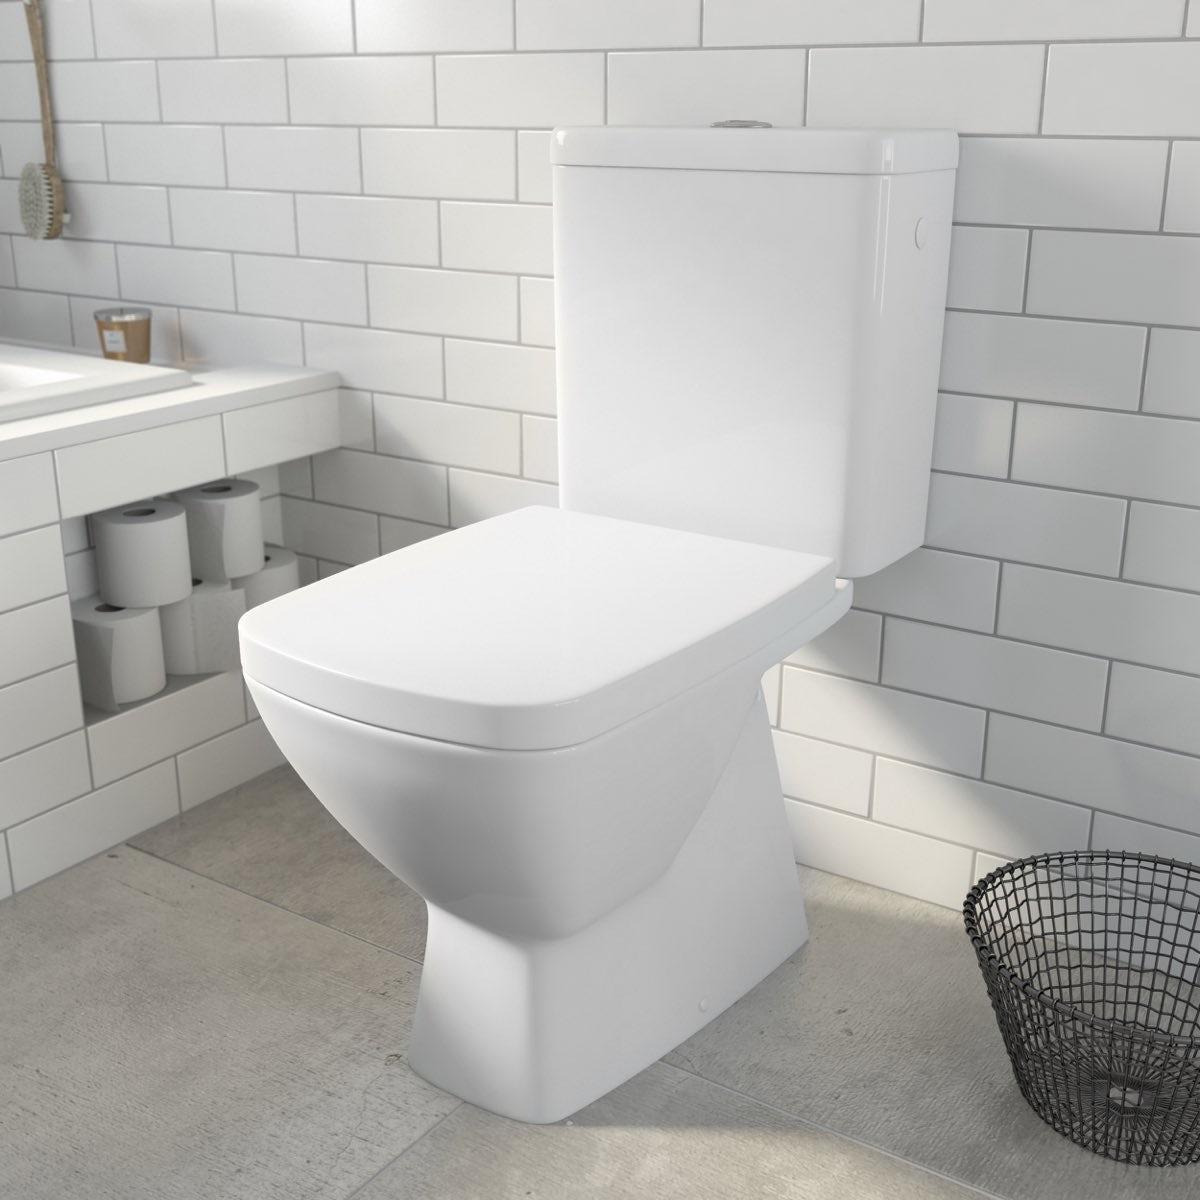 Verso Close Coupled Toilet inc. Seat